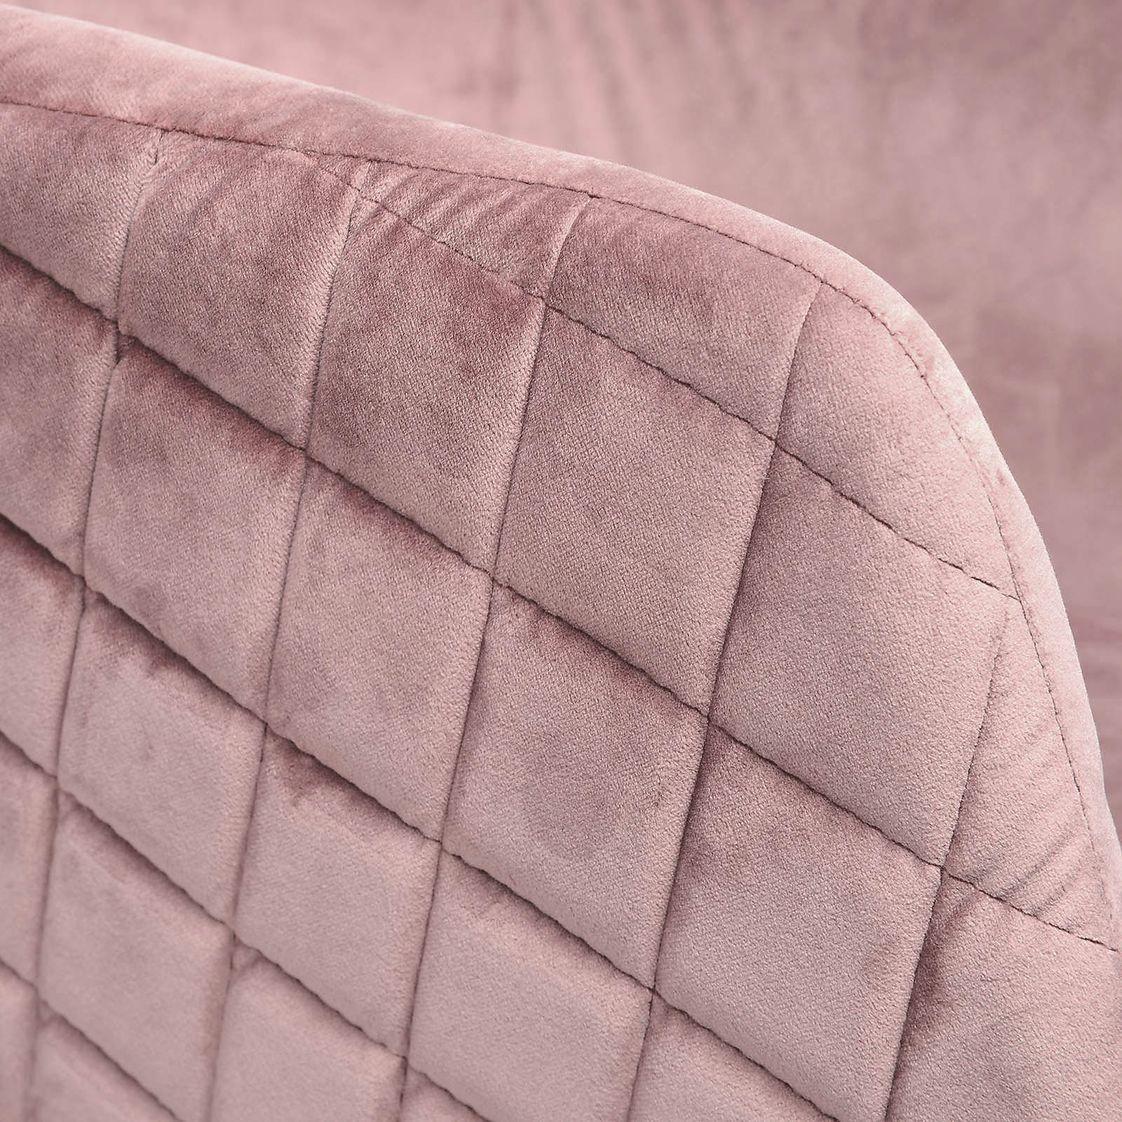 Stuhl Samt 55x76x57cm Altrosastuhl Samt 55x76x57cm Altrosa Altrosa Rosa Stuhle Altrosa Und Samt